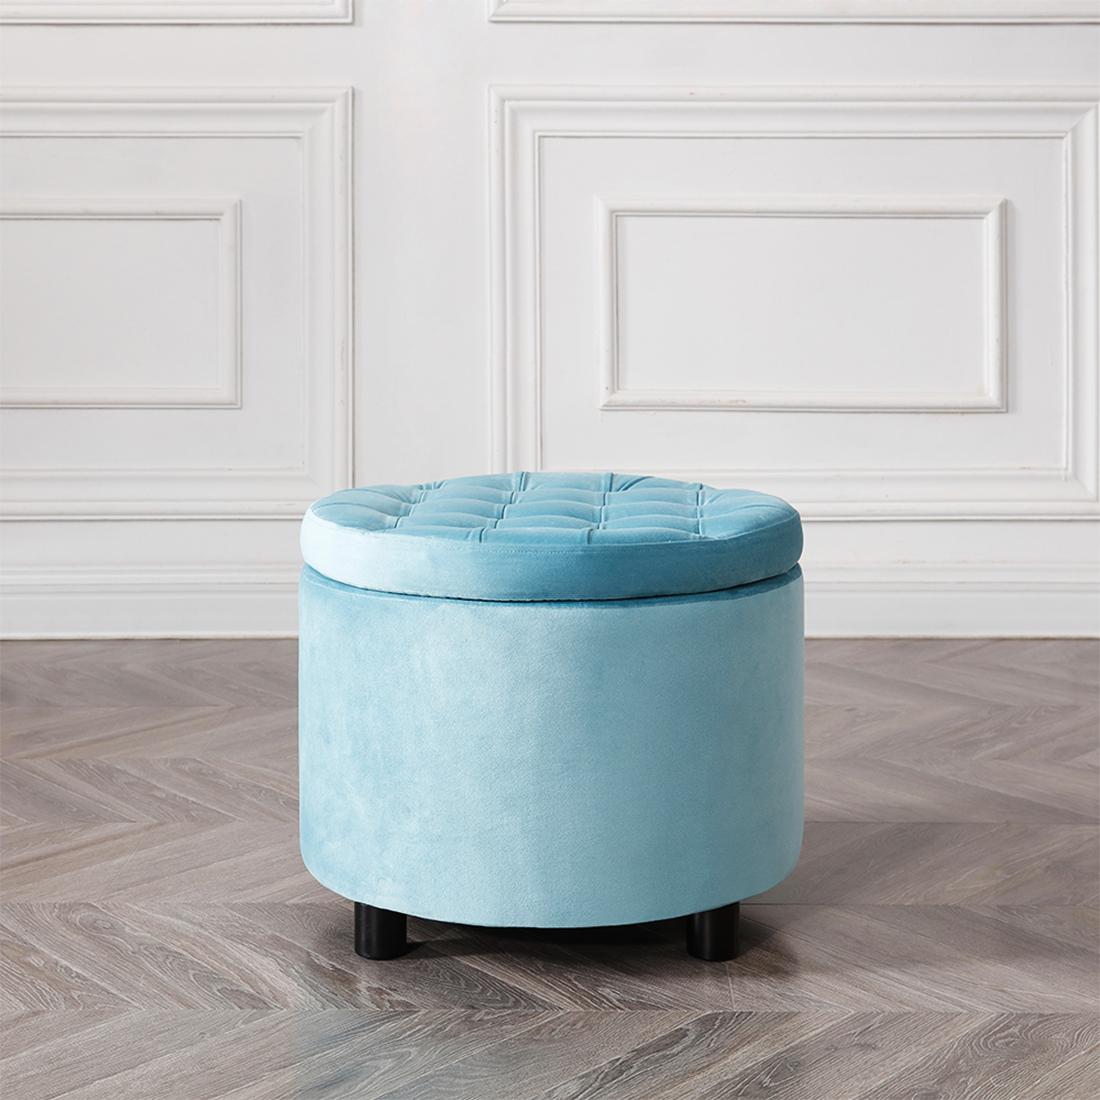 Reatai modern round velvet foot stool storage chair bedroom ottoman stool sofa with storage